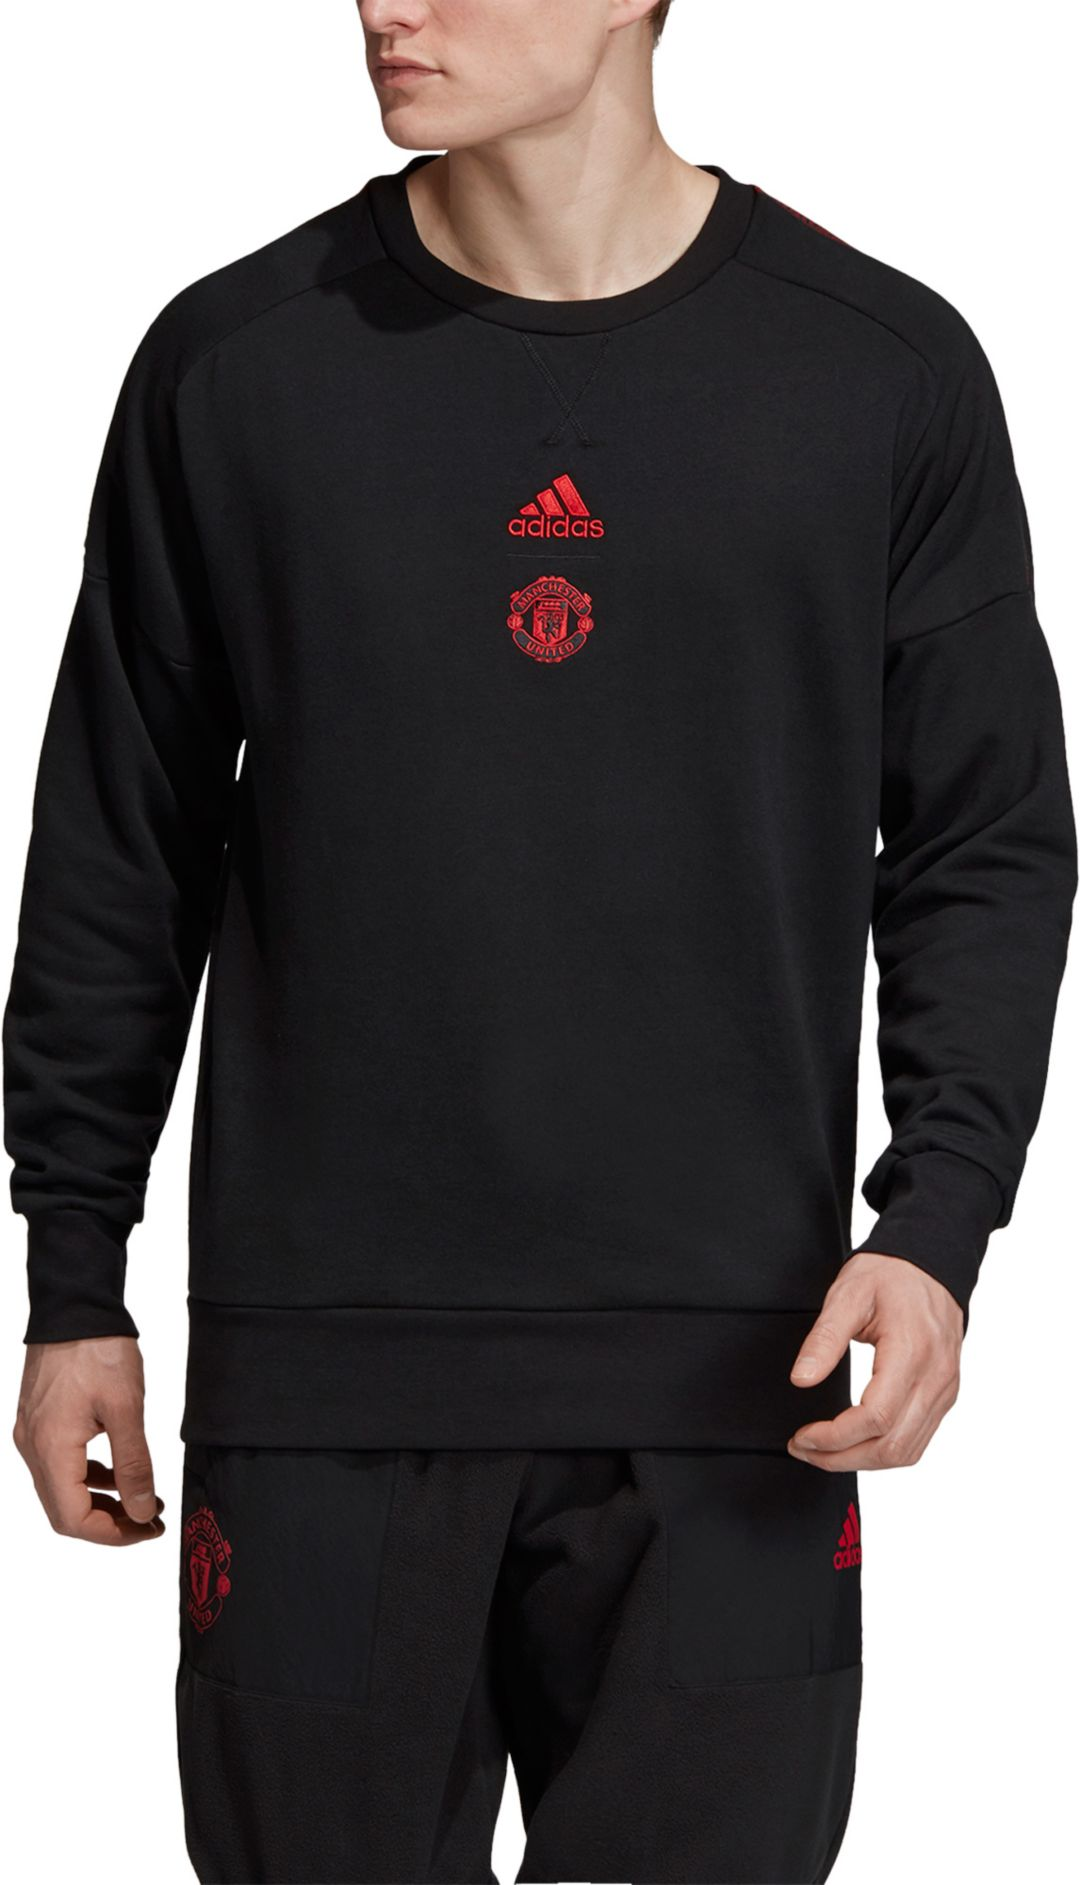 bas prix 2304a b5a59 adidas Men's Manchester United SSP Black Crew Neck Sweatshirt